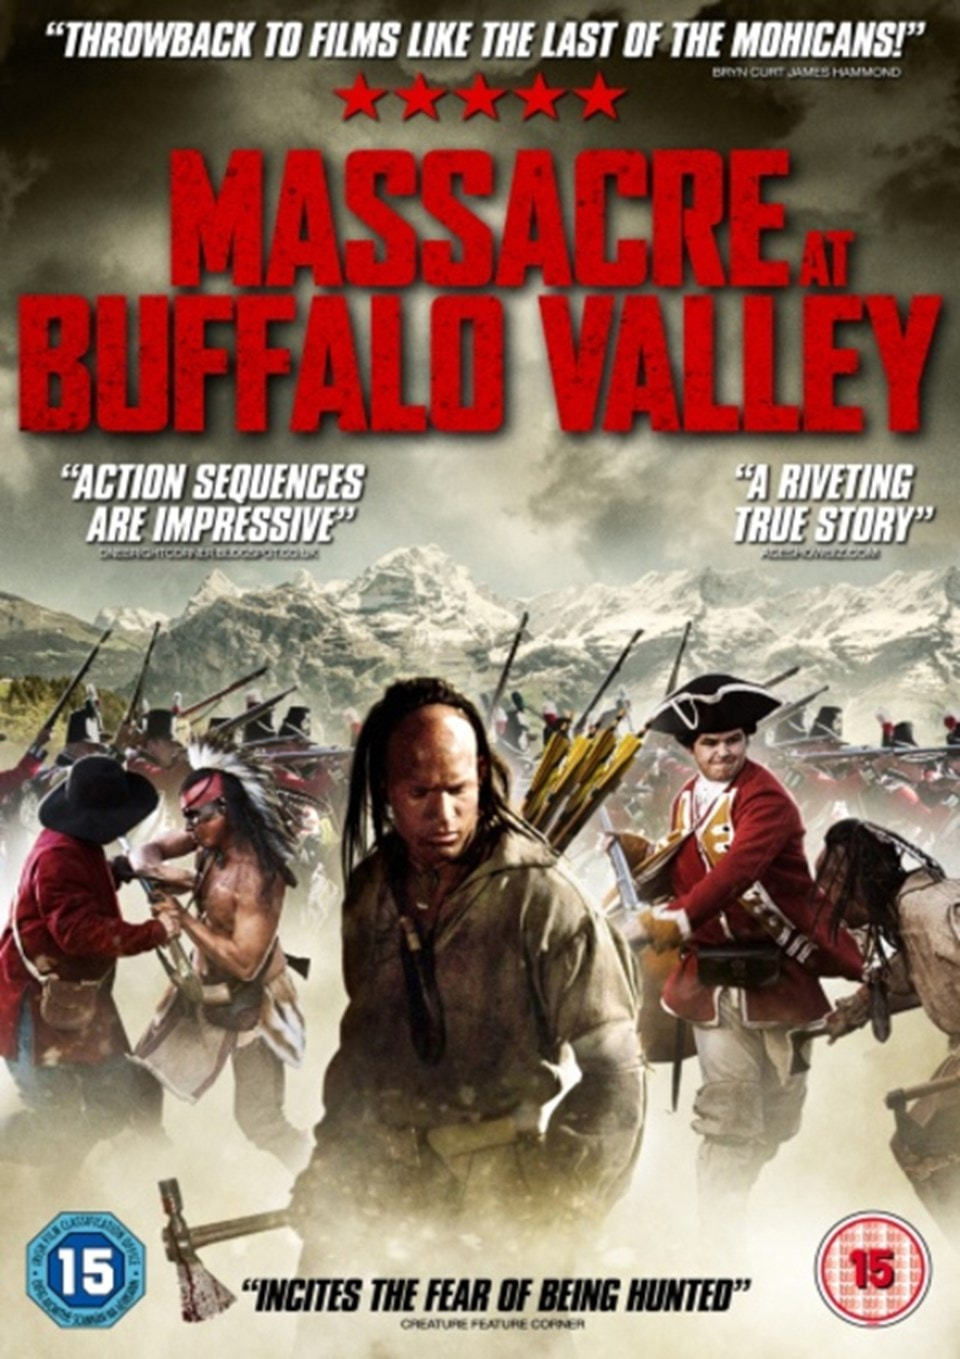 Massacre at Buffalo Valley - 1